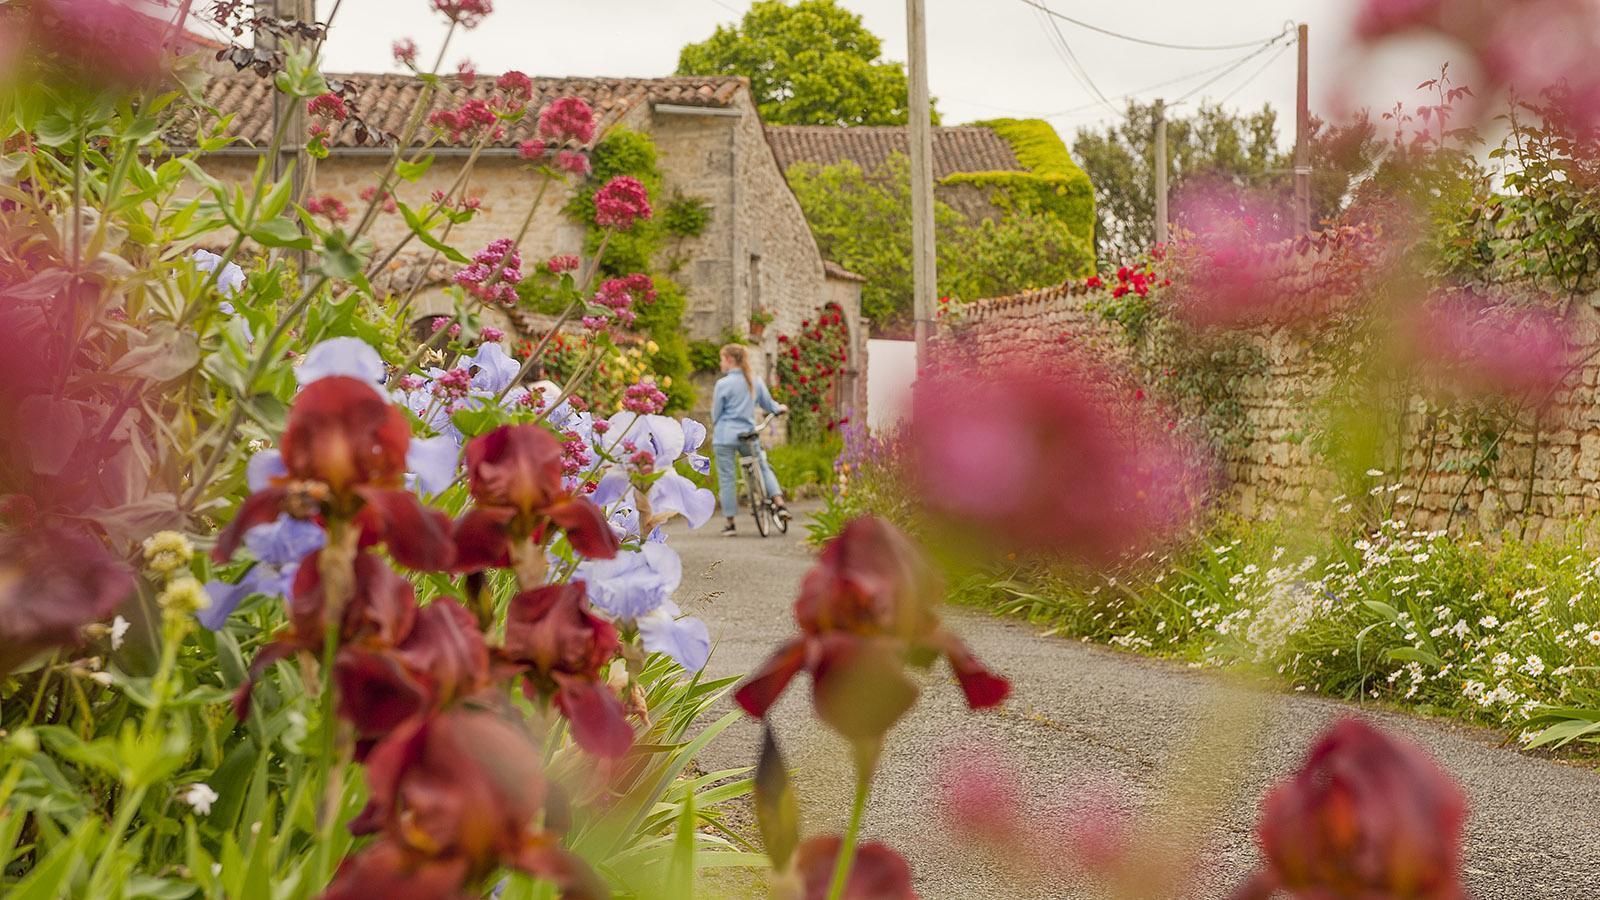 Bourg-Charente. Rue des Fleurs. Foto: Hilke Maunder